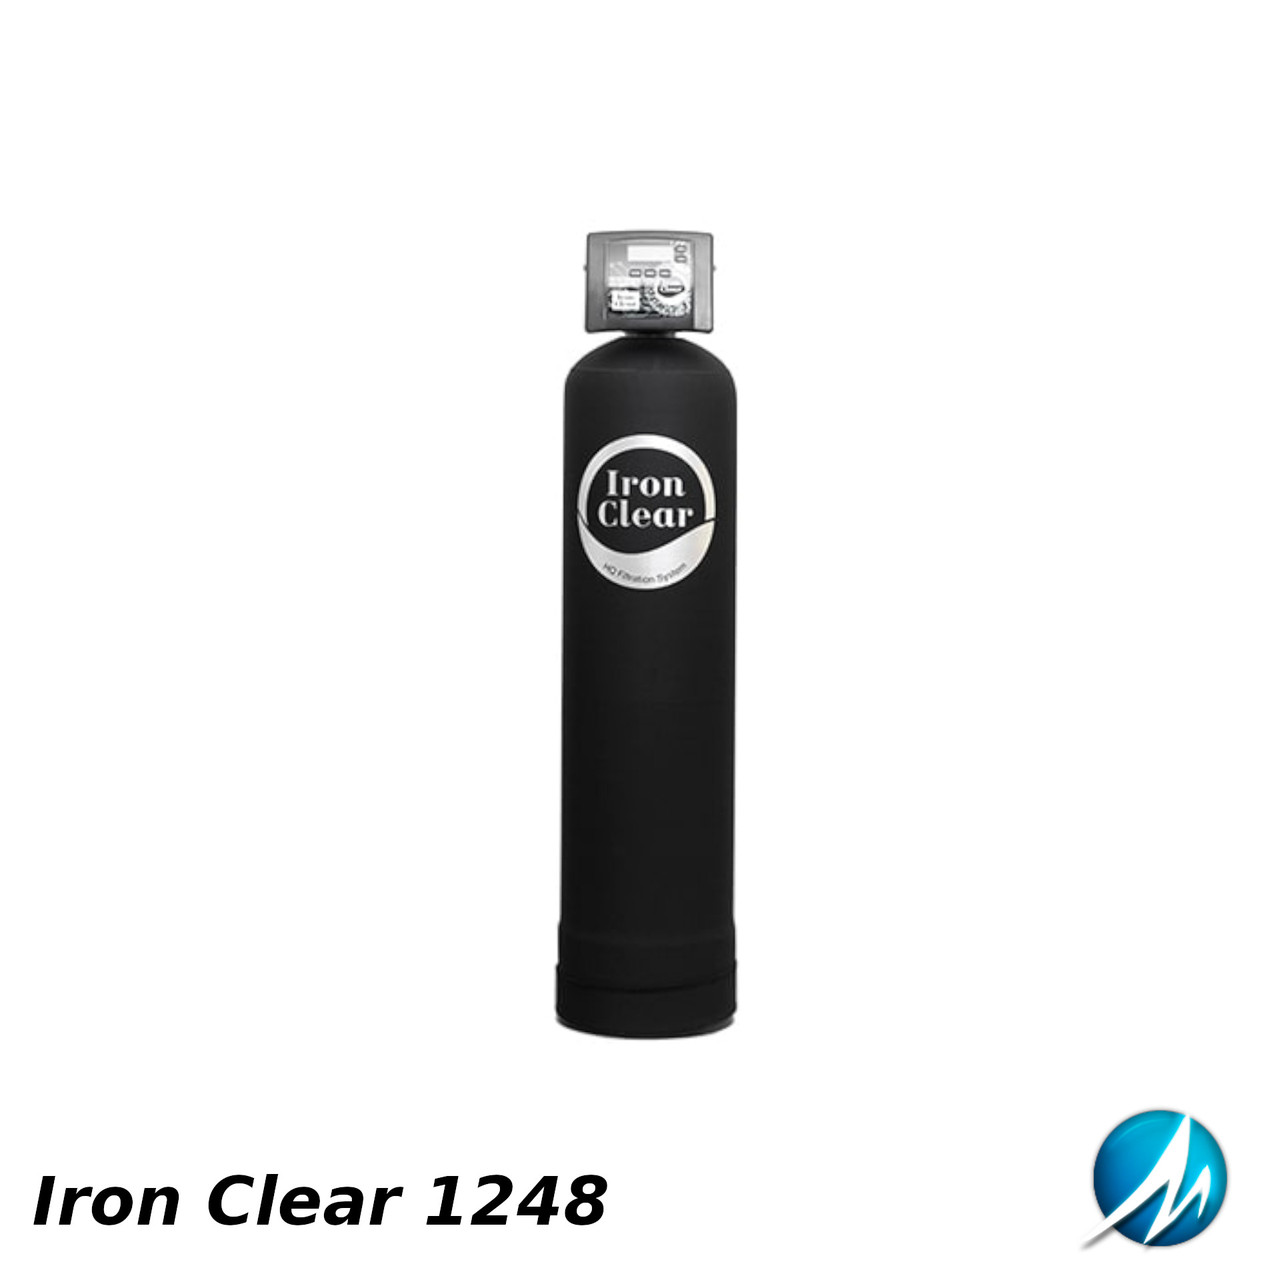 Iron Clear 1248 - система обезжелезивания воды